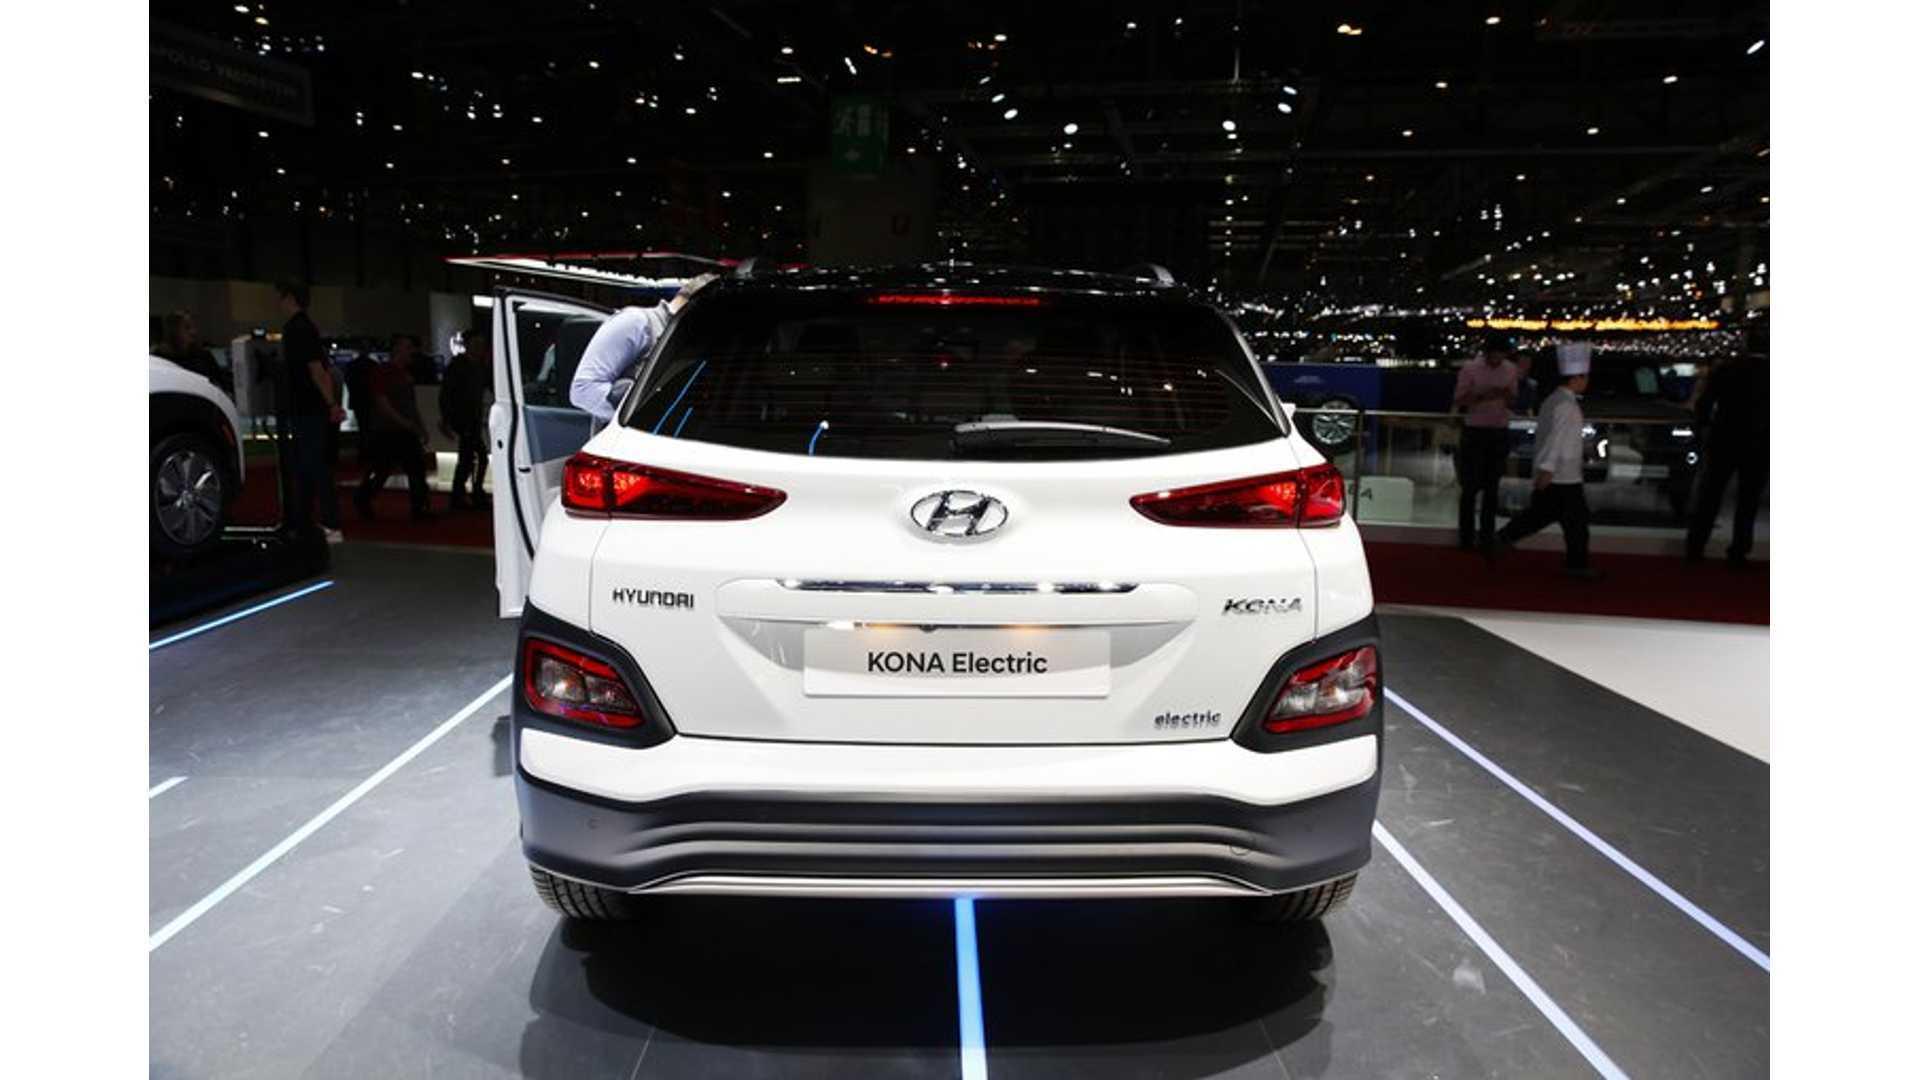 Canadian Hyundai Kona Electric Buyers Observe Delays, Poor